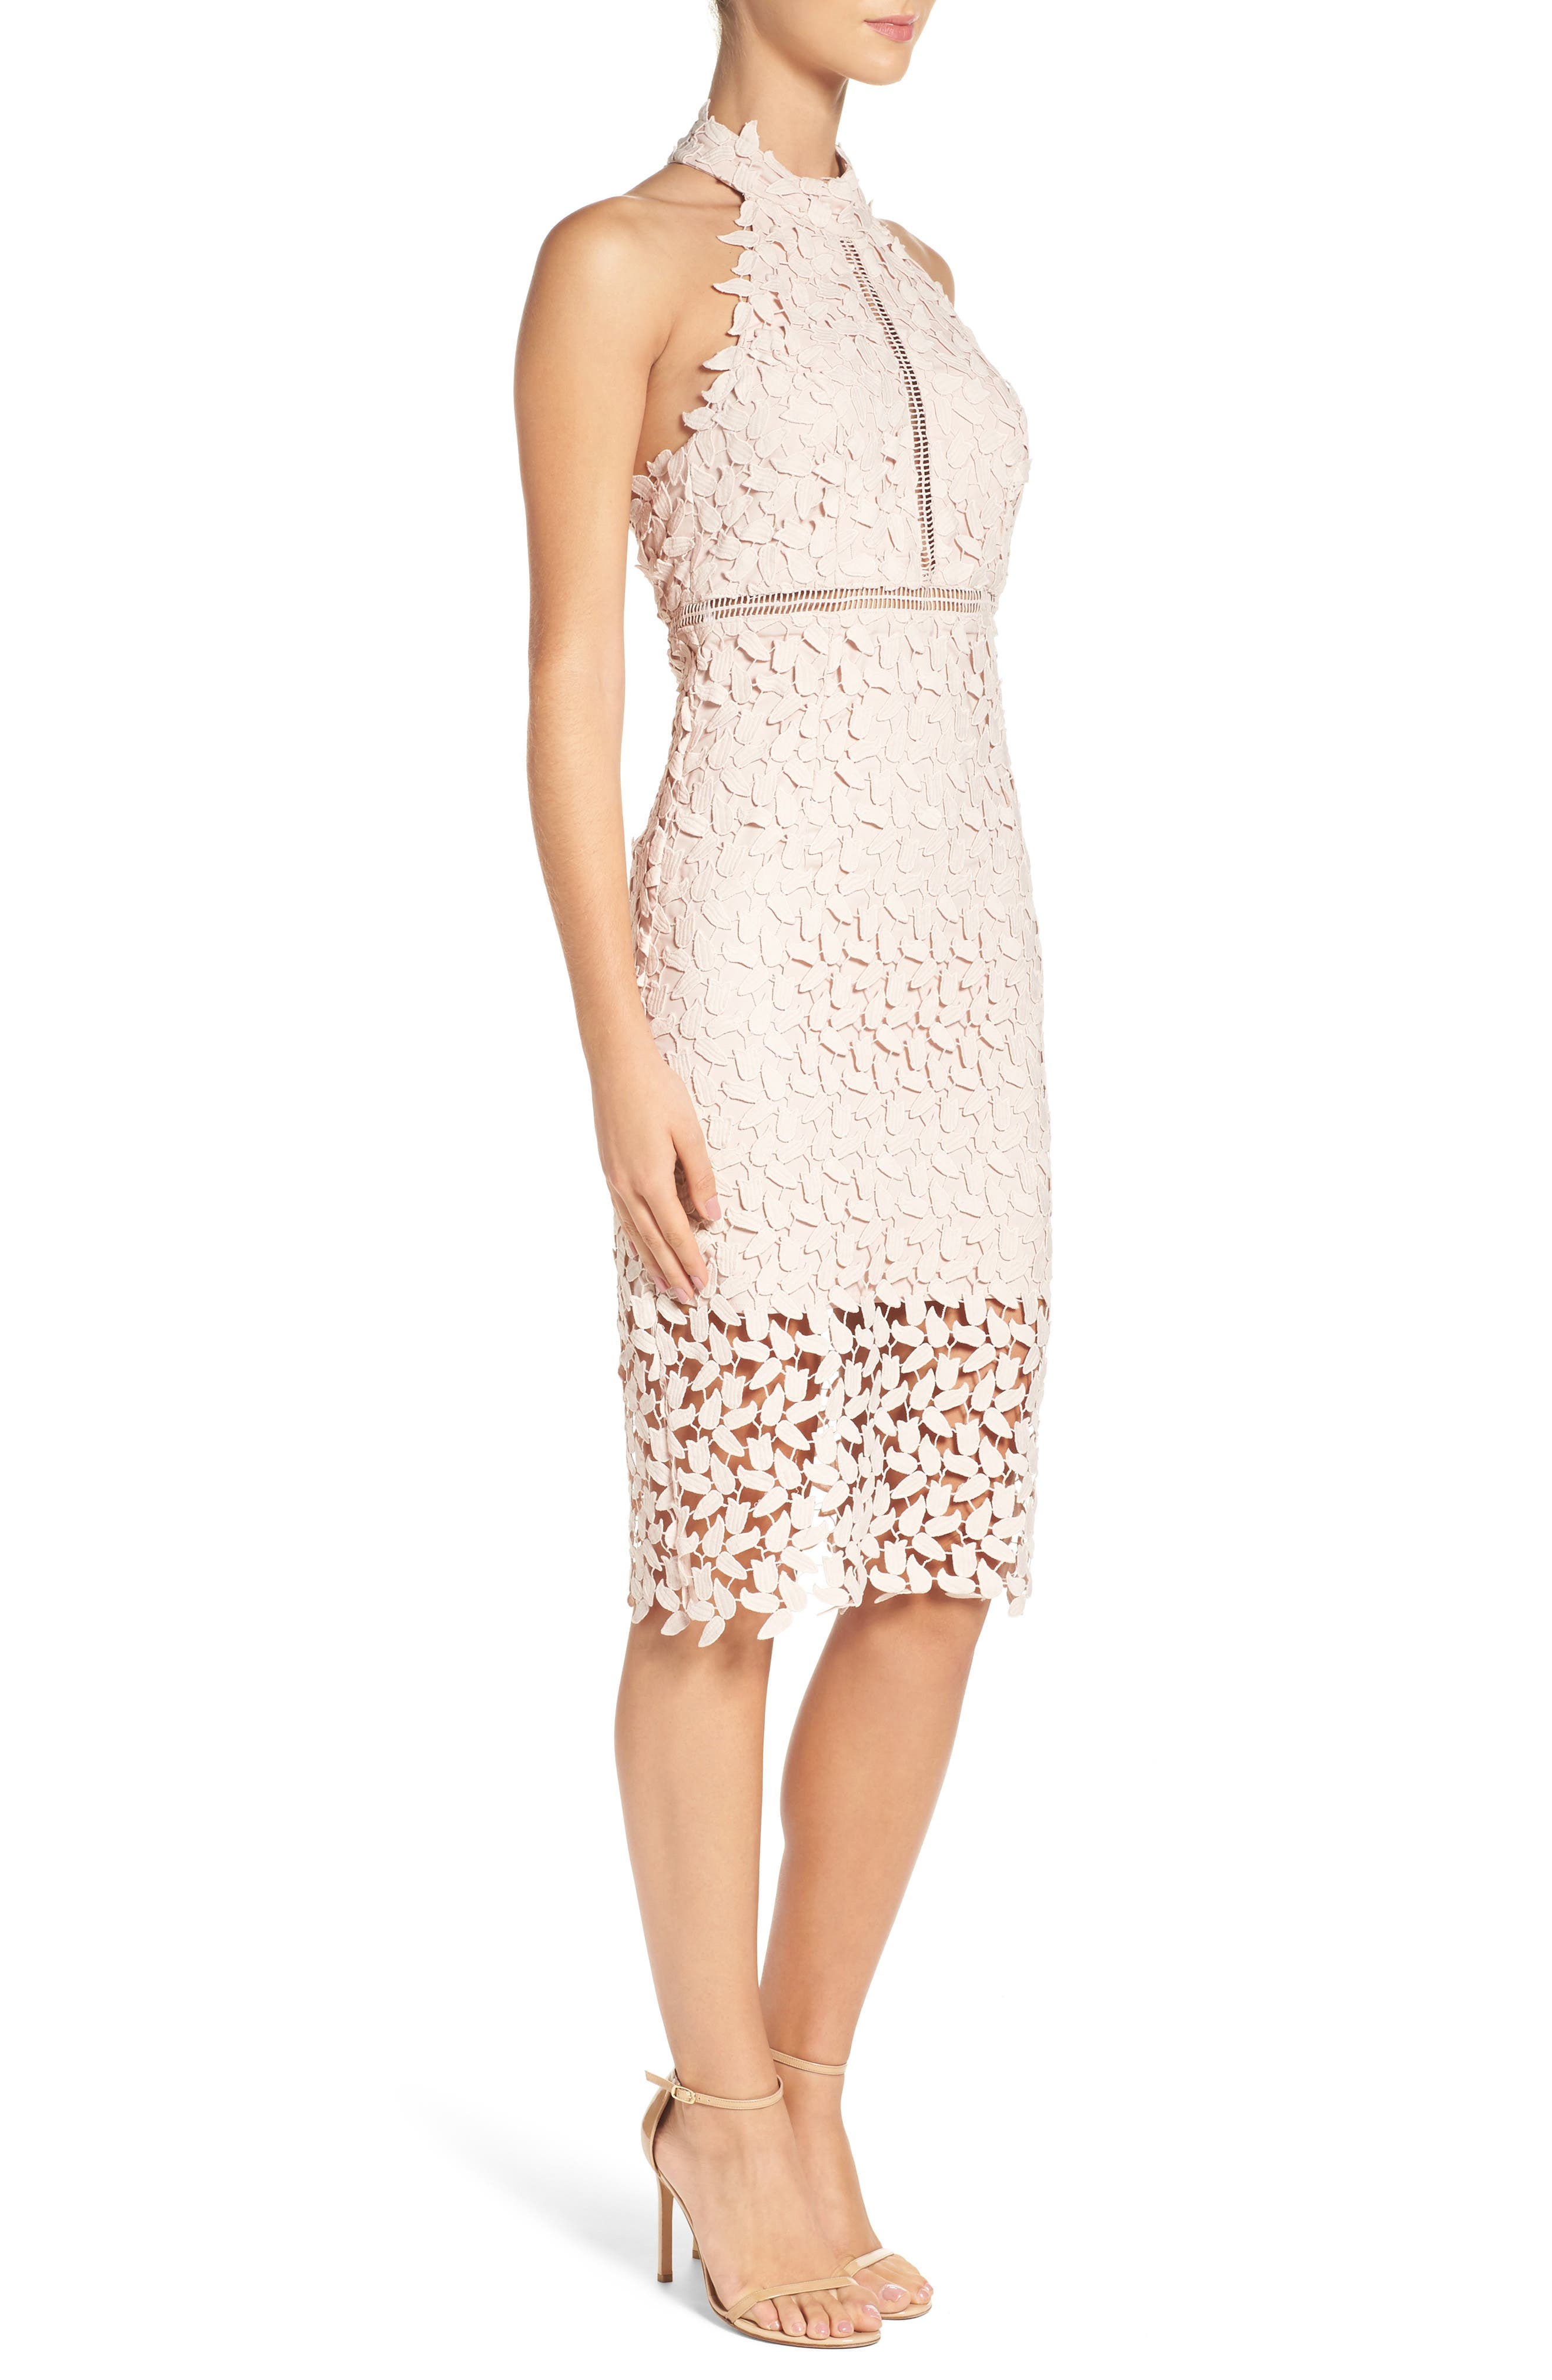 BARDOT, Gemma Halter Lace Sheath Dress, Alternate thumbnail 4, color, PROSECCO